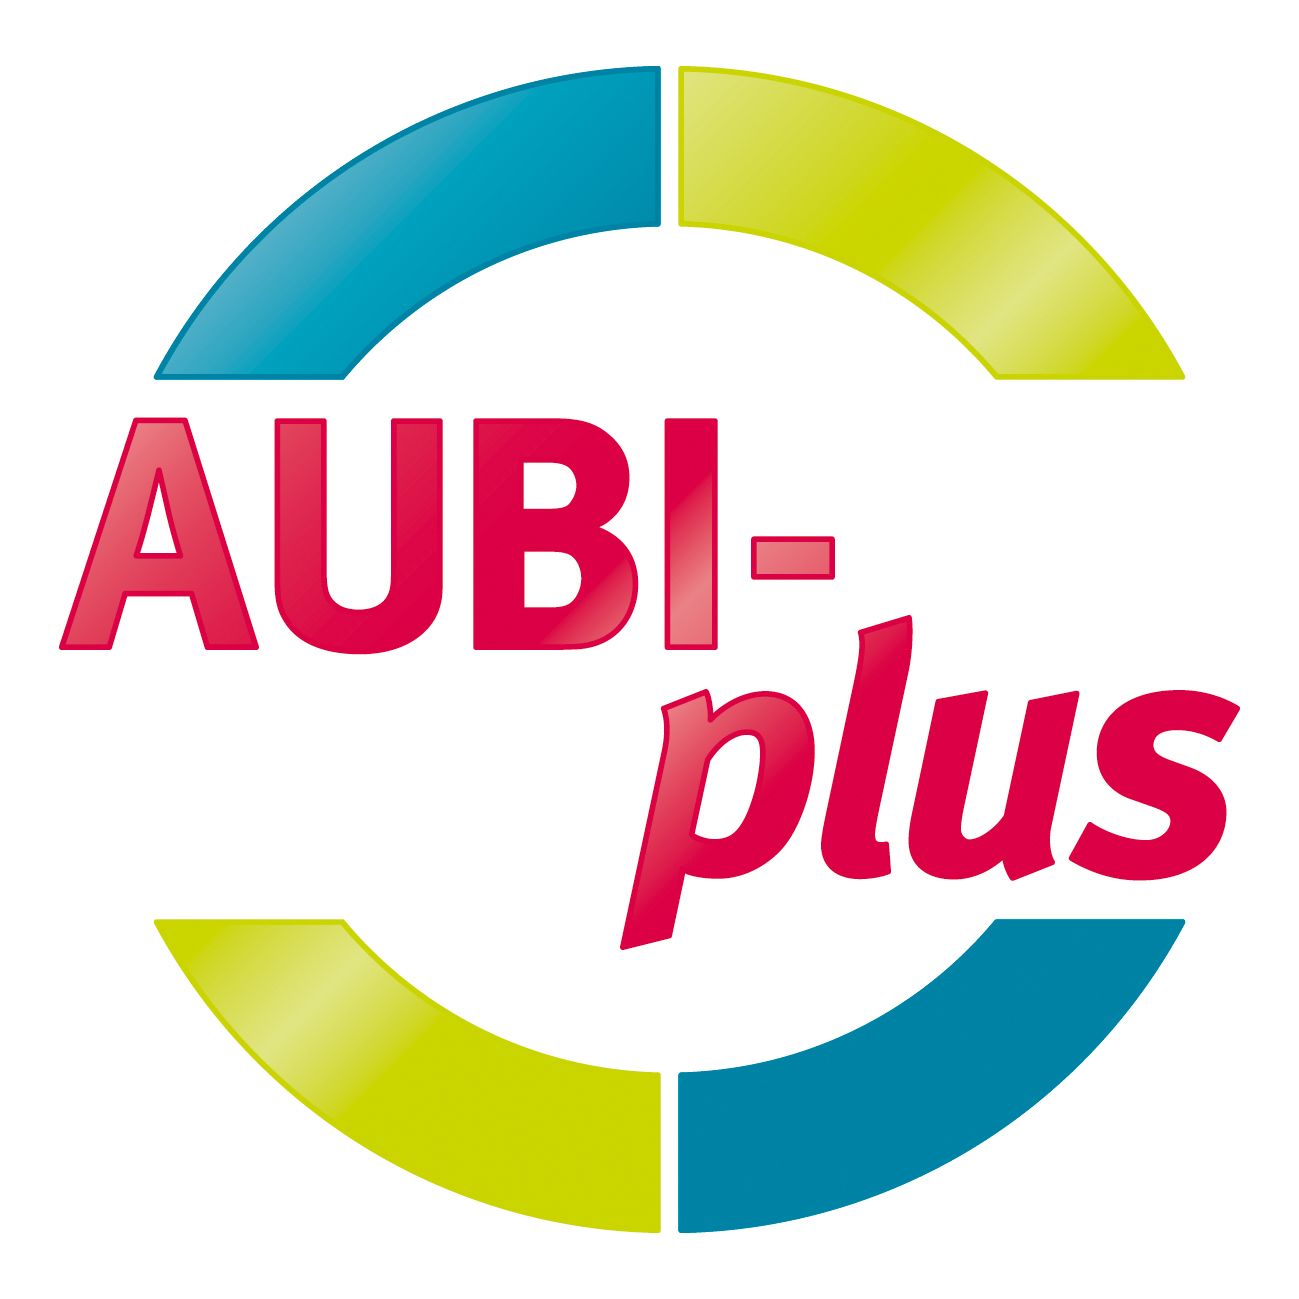 messedaten_messe_215_weblogos_aubiplus_gmbh.jpg